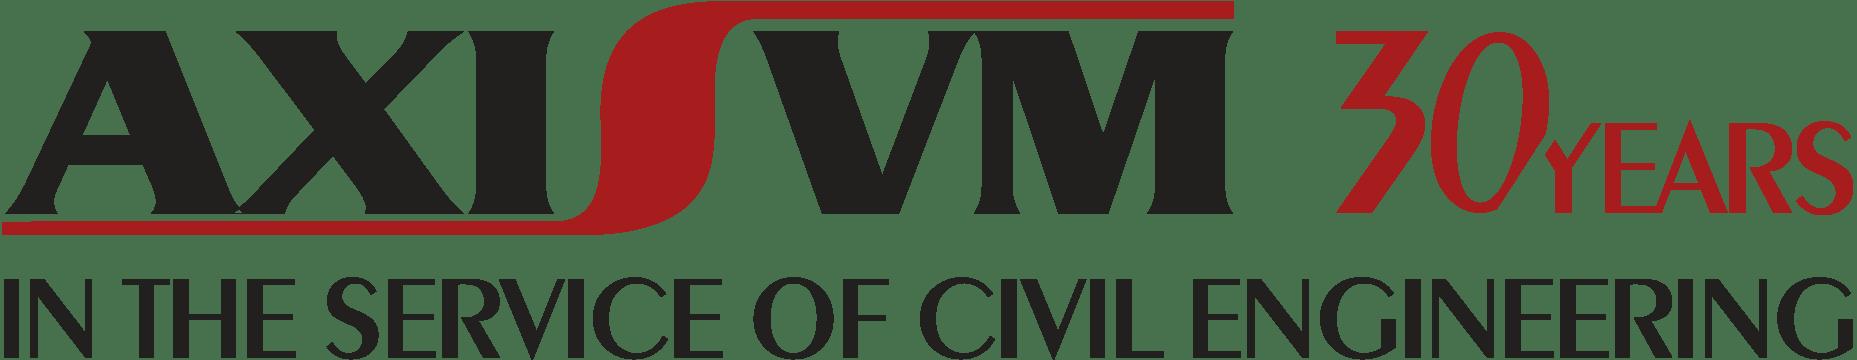 AxisVM 30 years anniversary logo